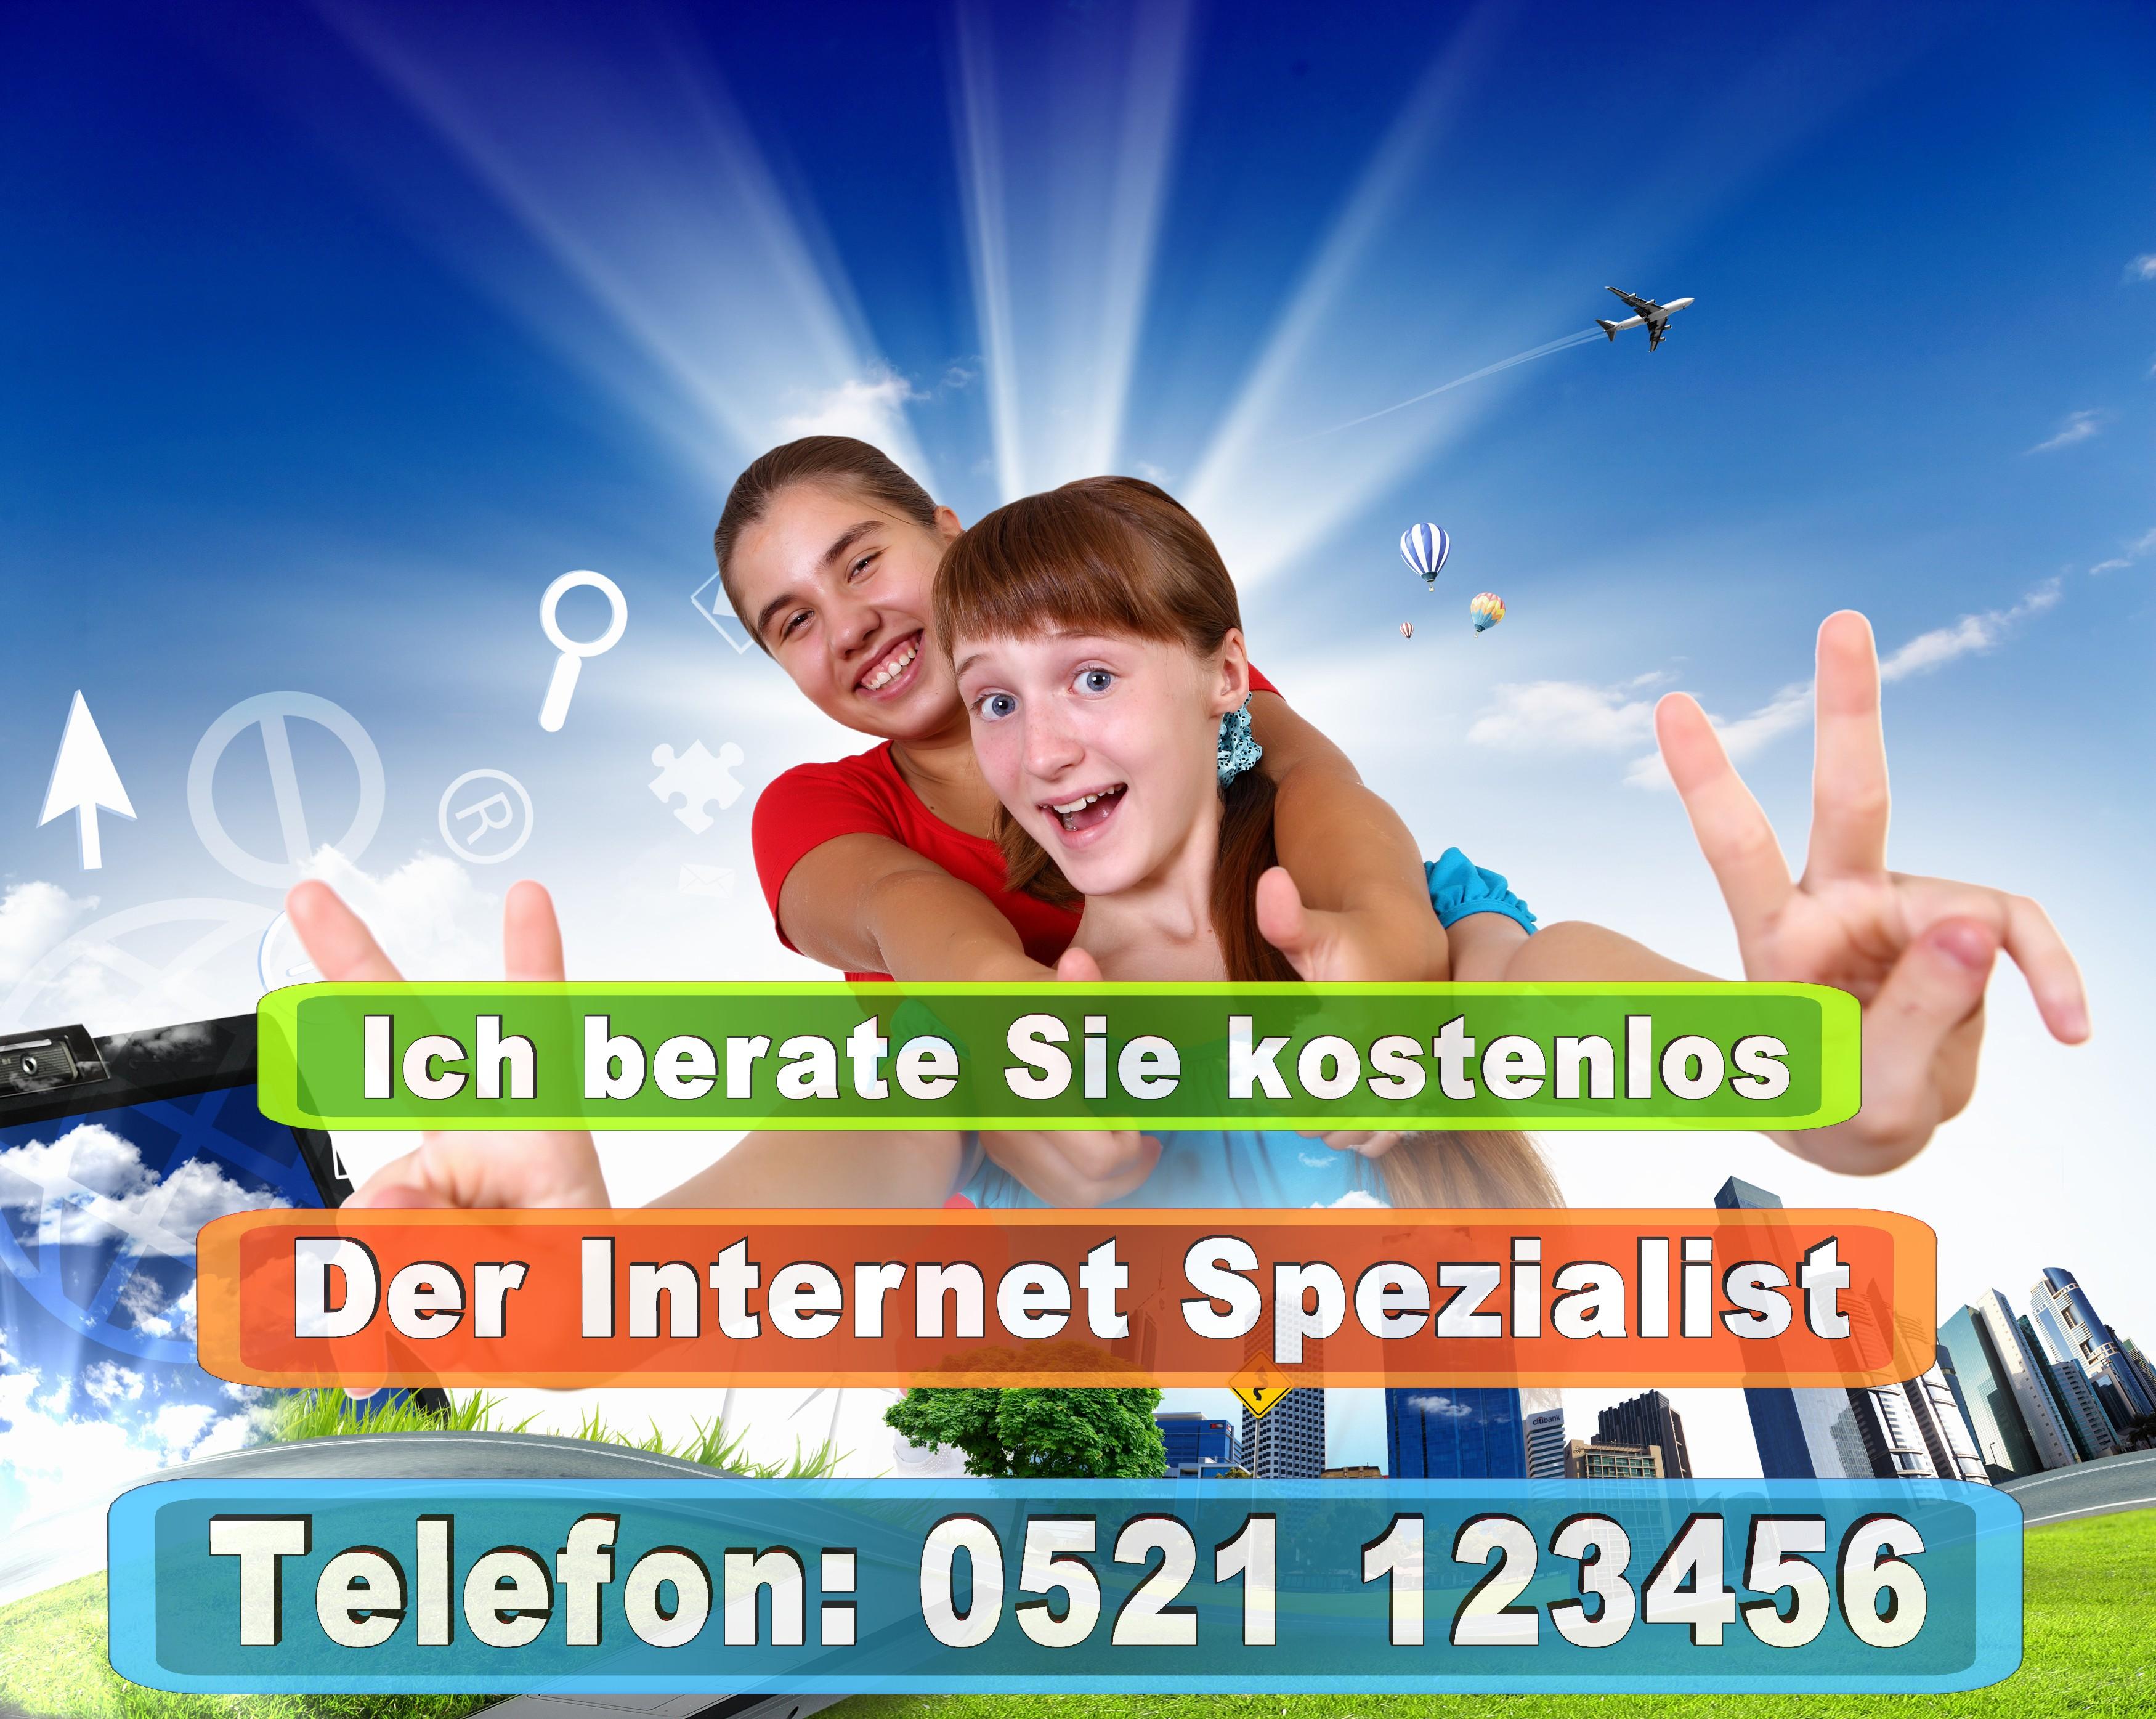 Schulen Bielefeld Schule Grundschule Sonderschule Hauptschule Realschule Schulhof Turnhalle Sporthalle Bielefeld NRW (5)